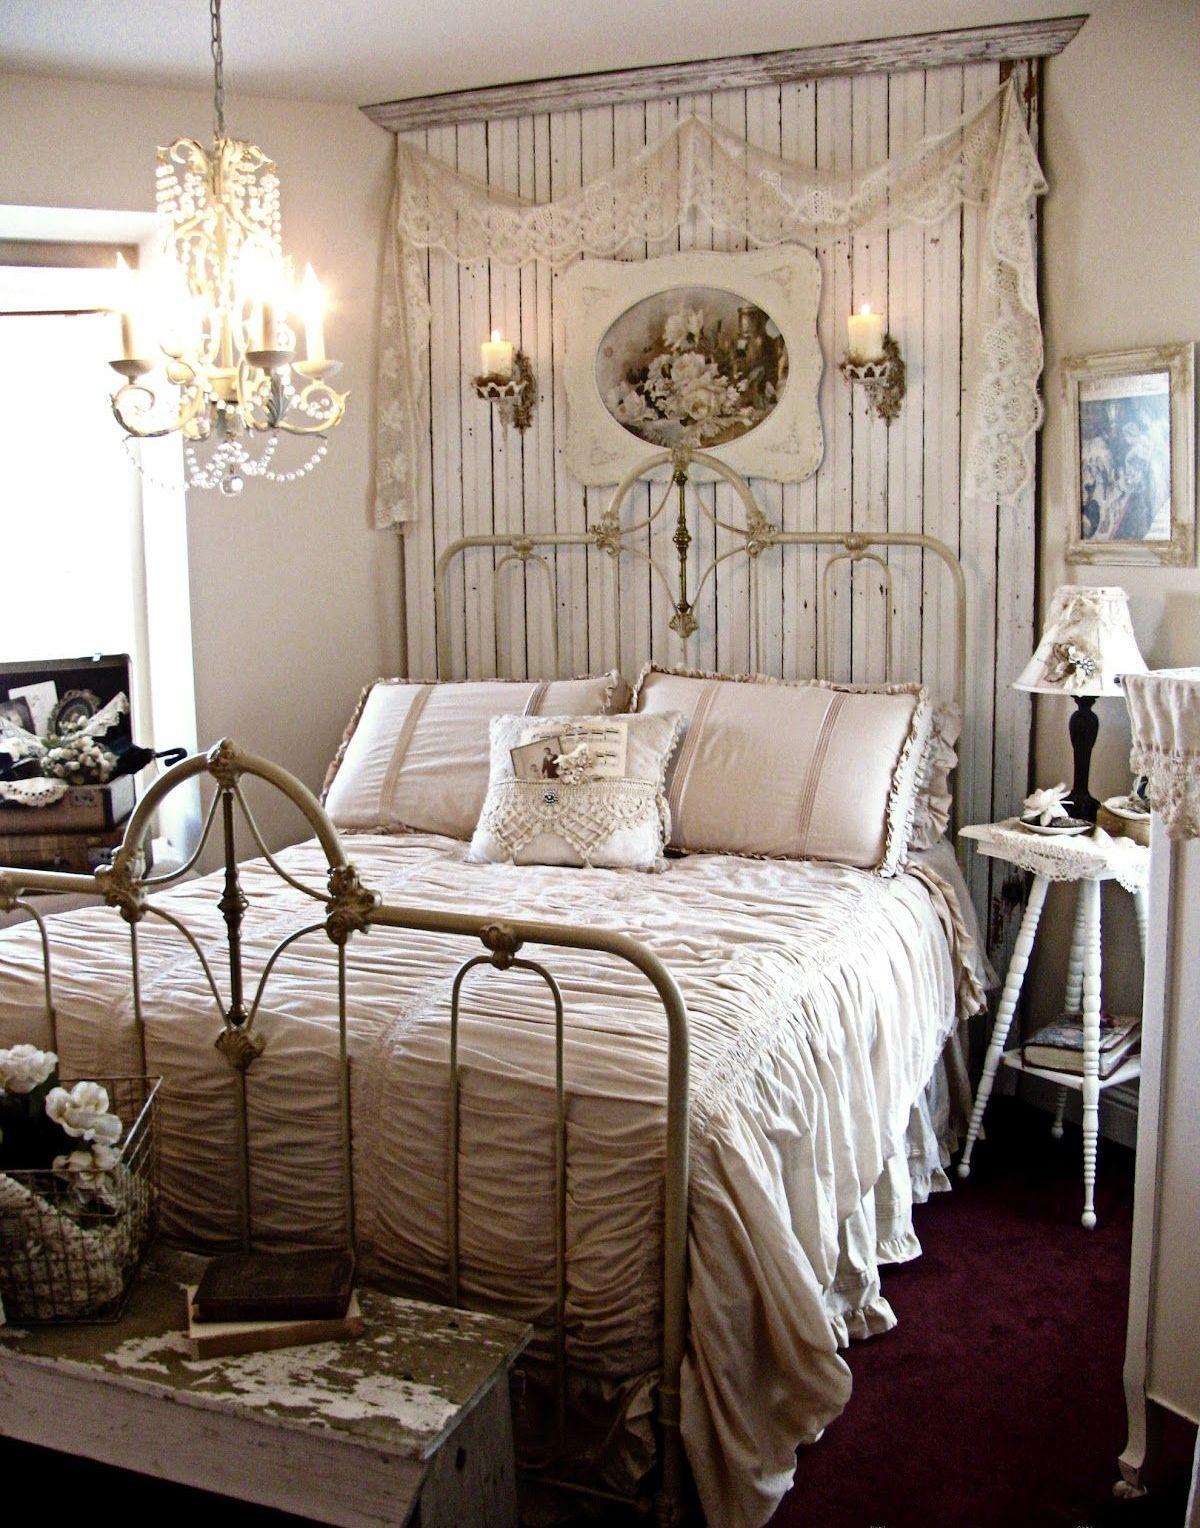 винтаж в интерьере дома декор спальни